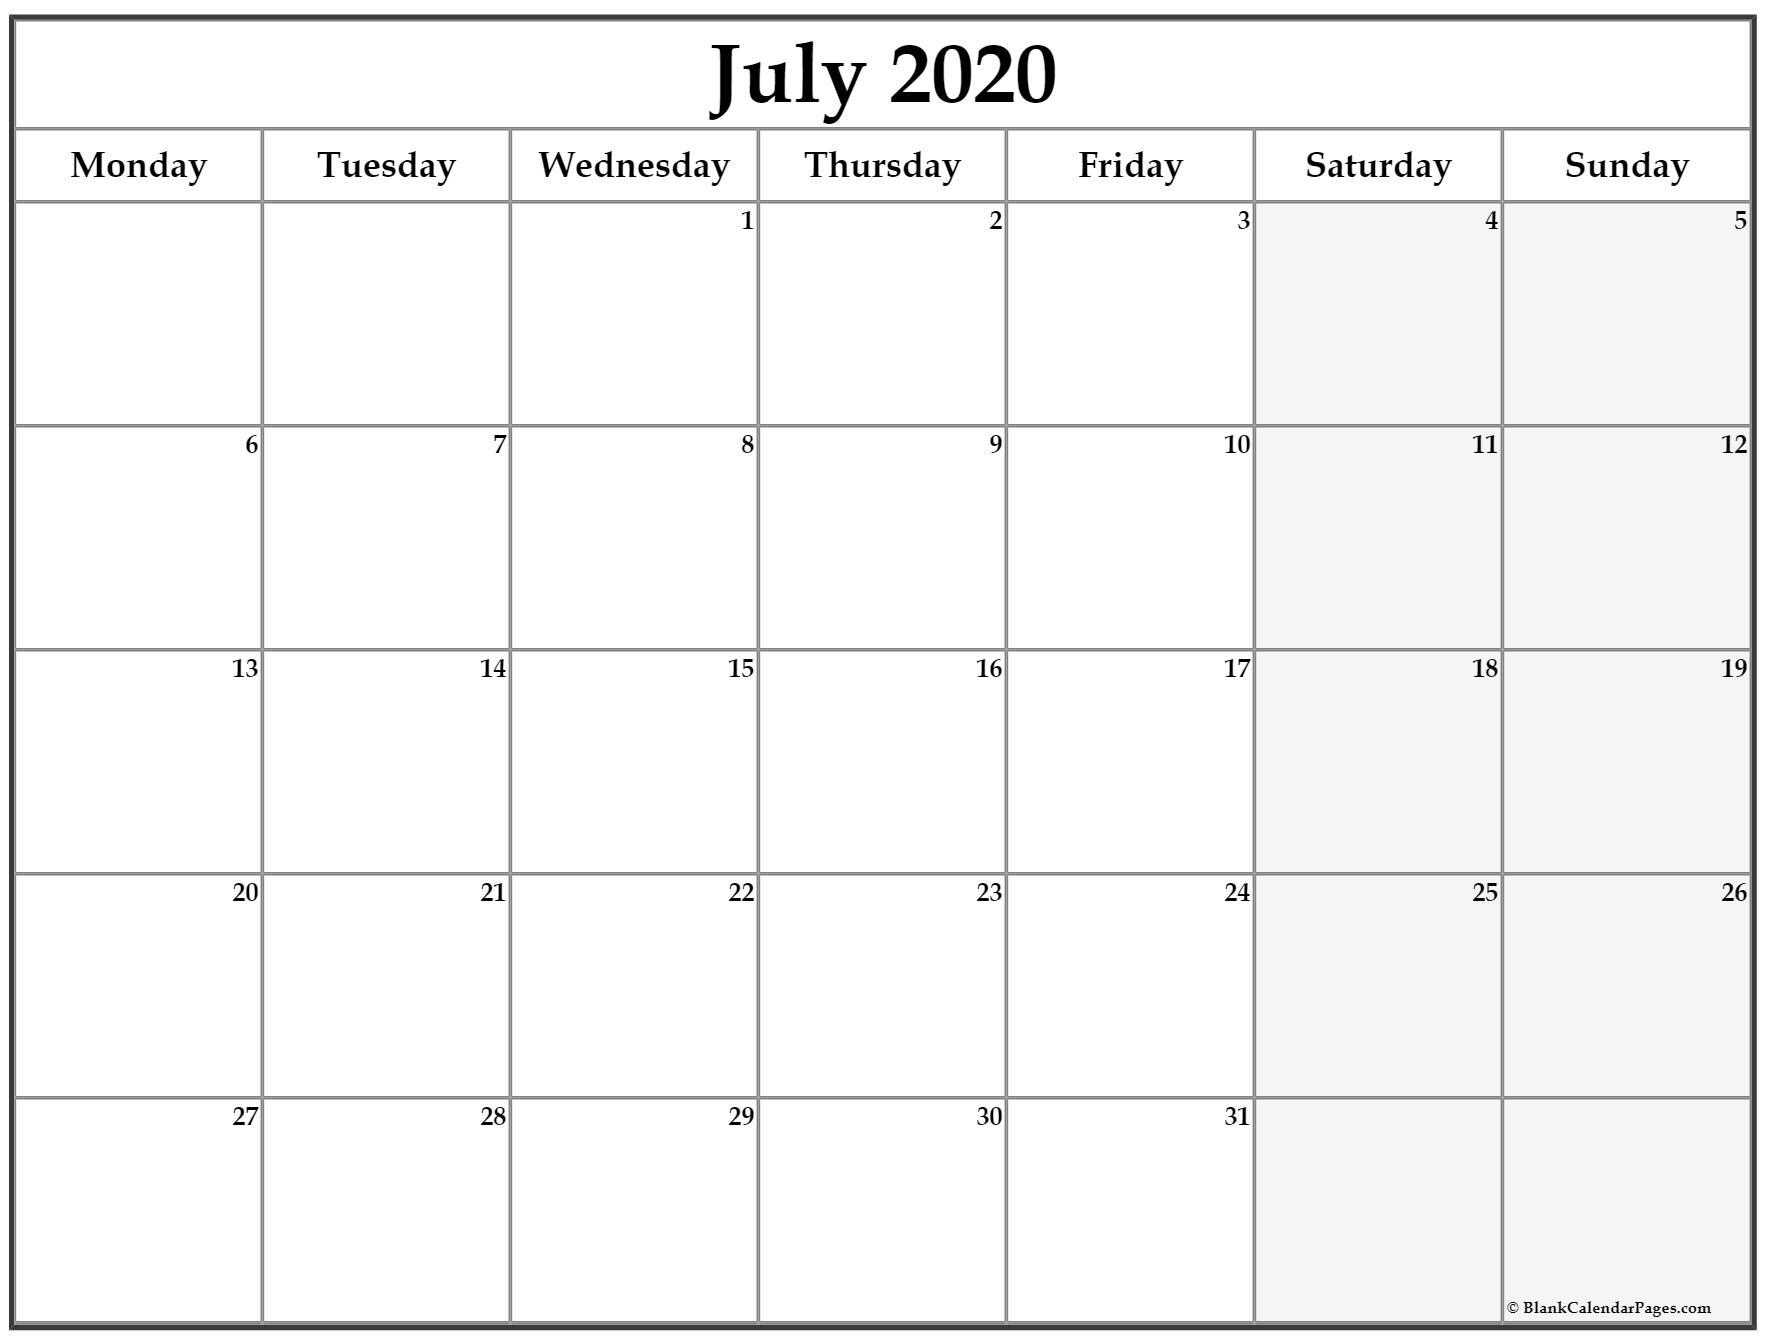 July 2020 Monday Calendar | Monday To Sunday for Printable Monday Calendar Monday Start